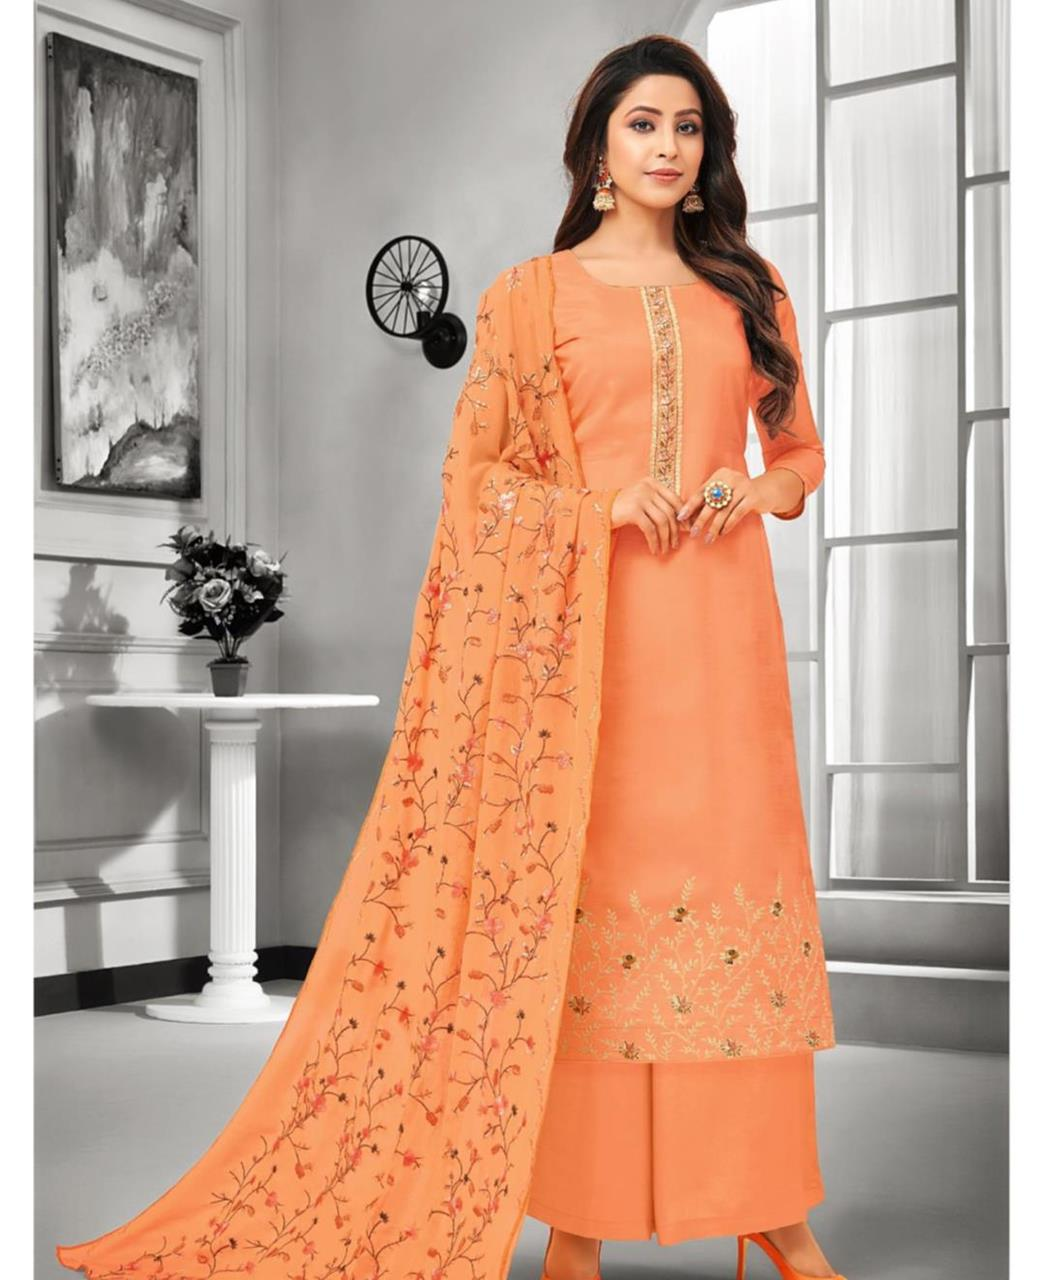 Embroidered Satin Orange Palazzo Suit Salwar